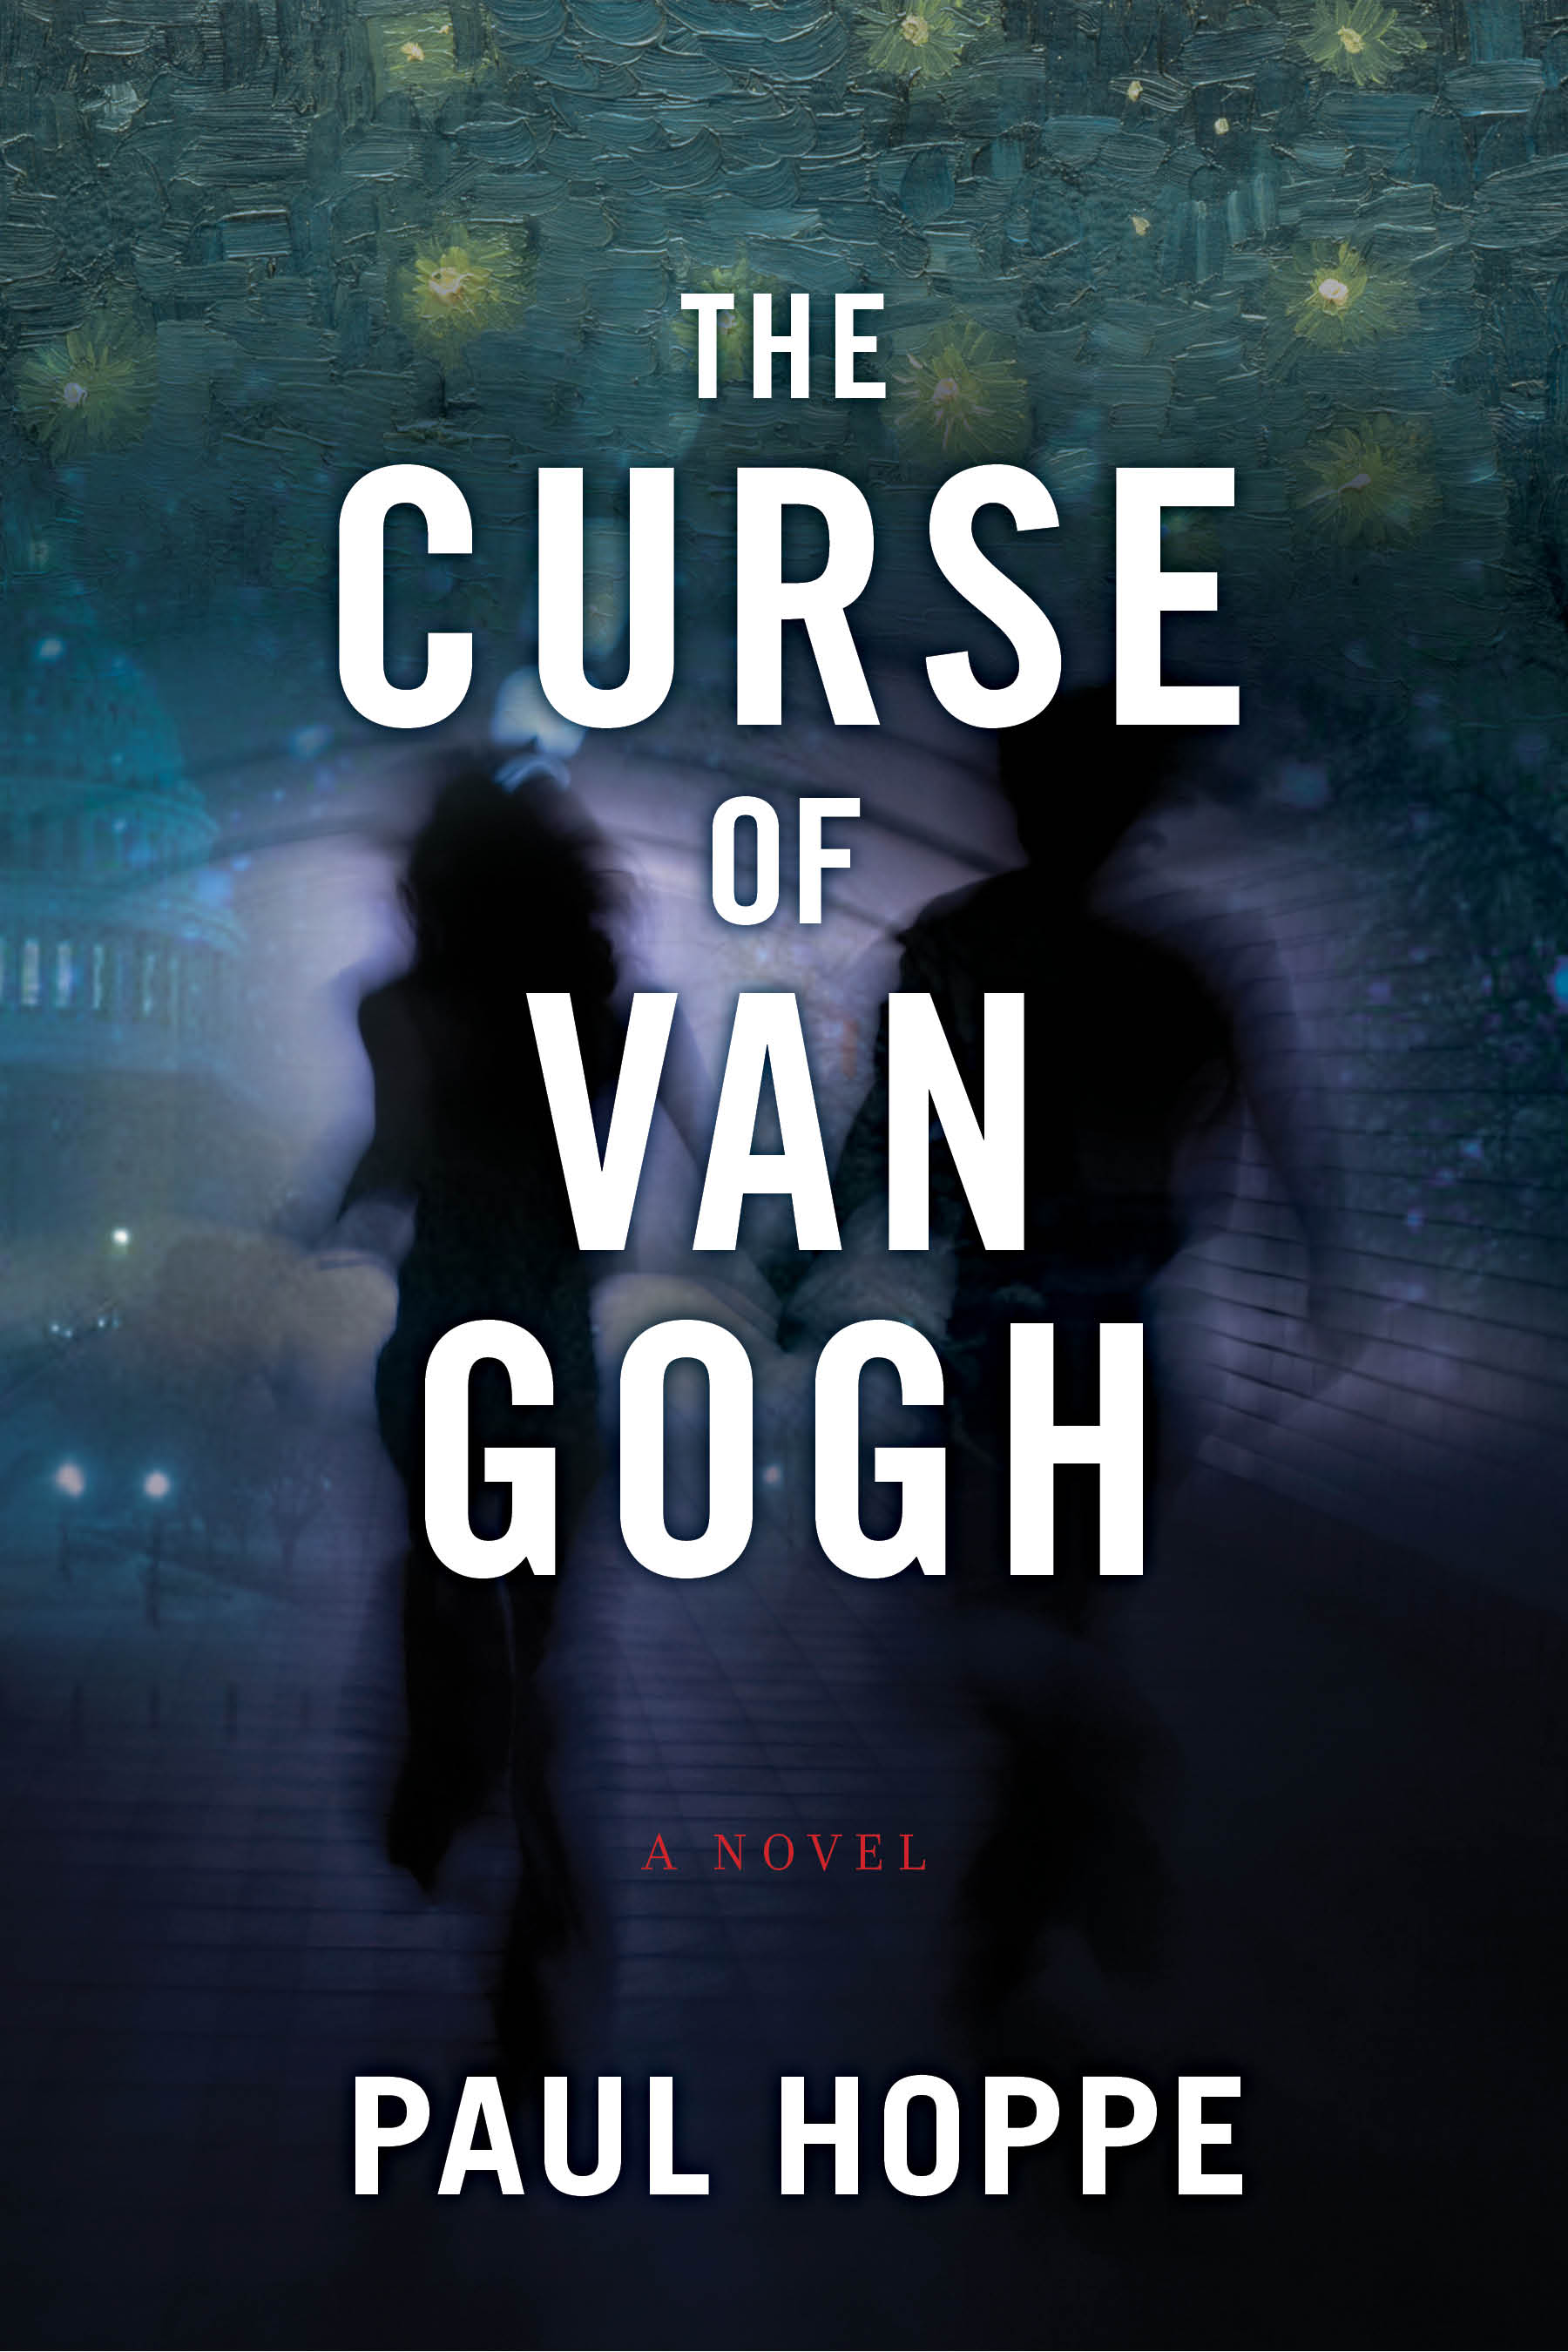 The Curse of Van Gosh- Paul Hoppe